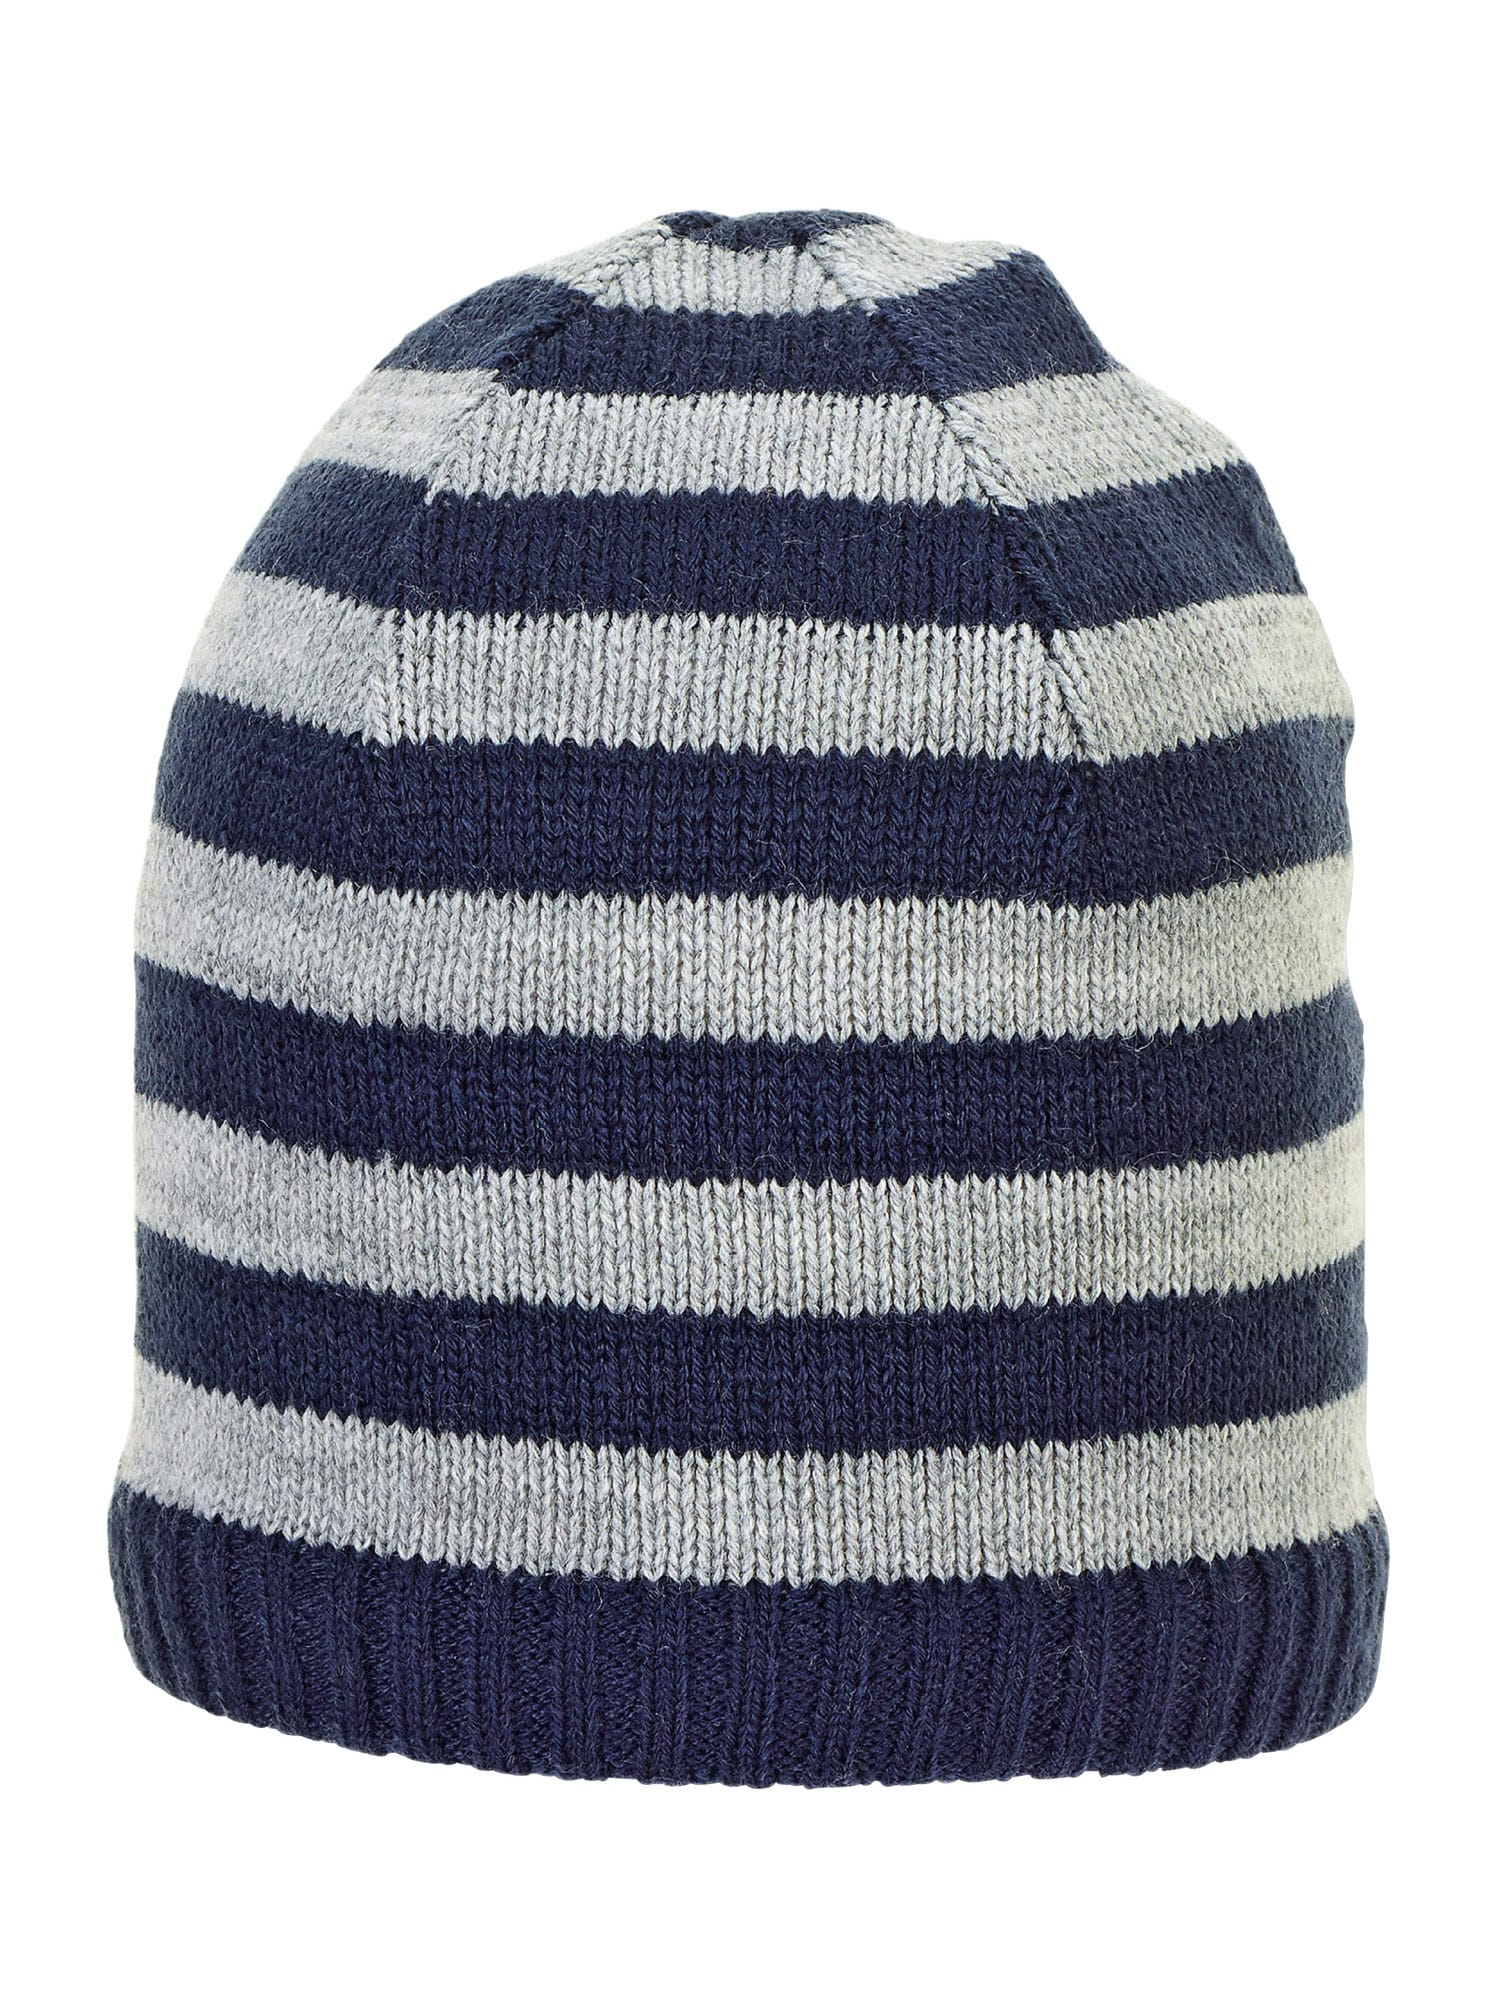 STERNTALER Megzta kepurė tamsiai mėlyna jūros spalva / pilka